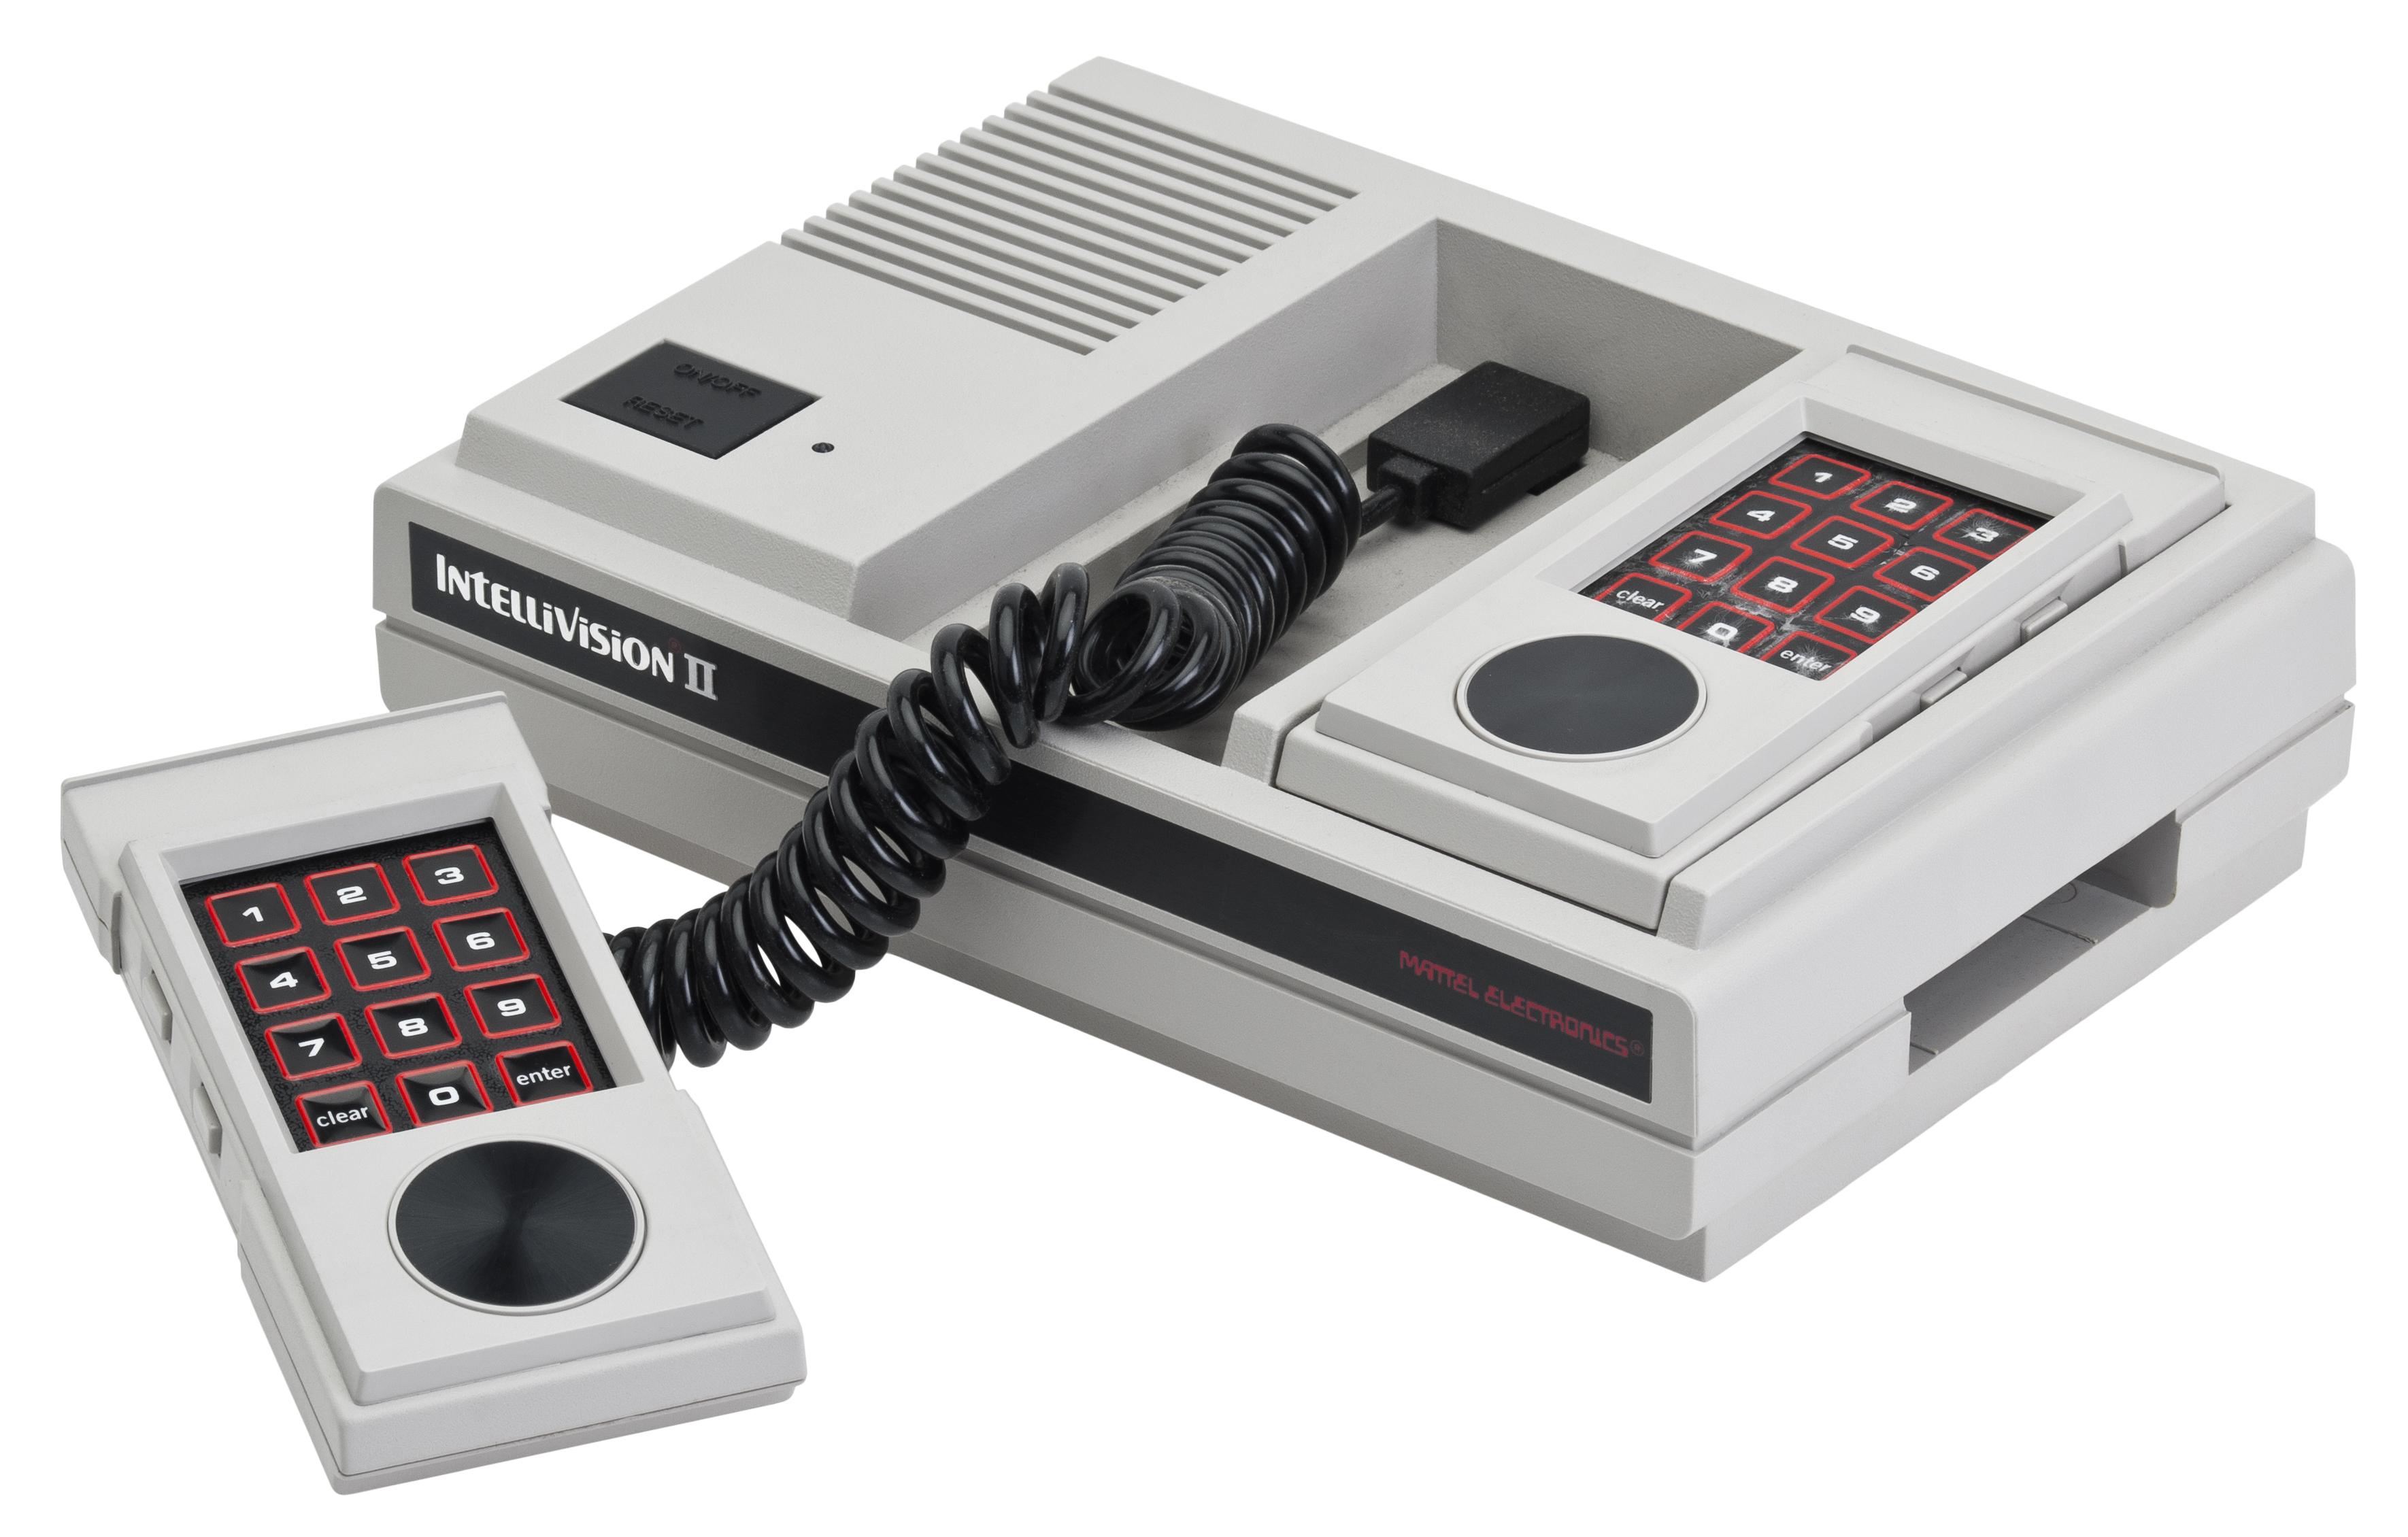 Intellivision-II-Console-Set.jpg